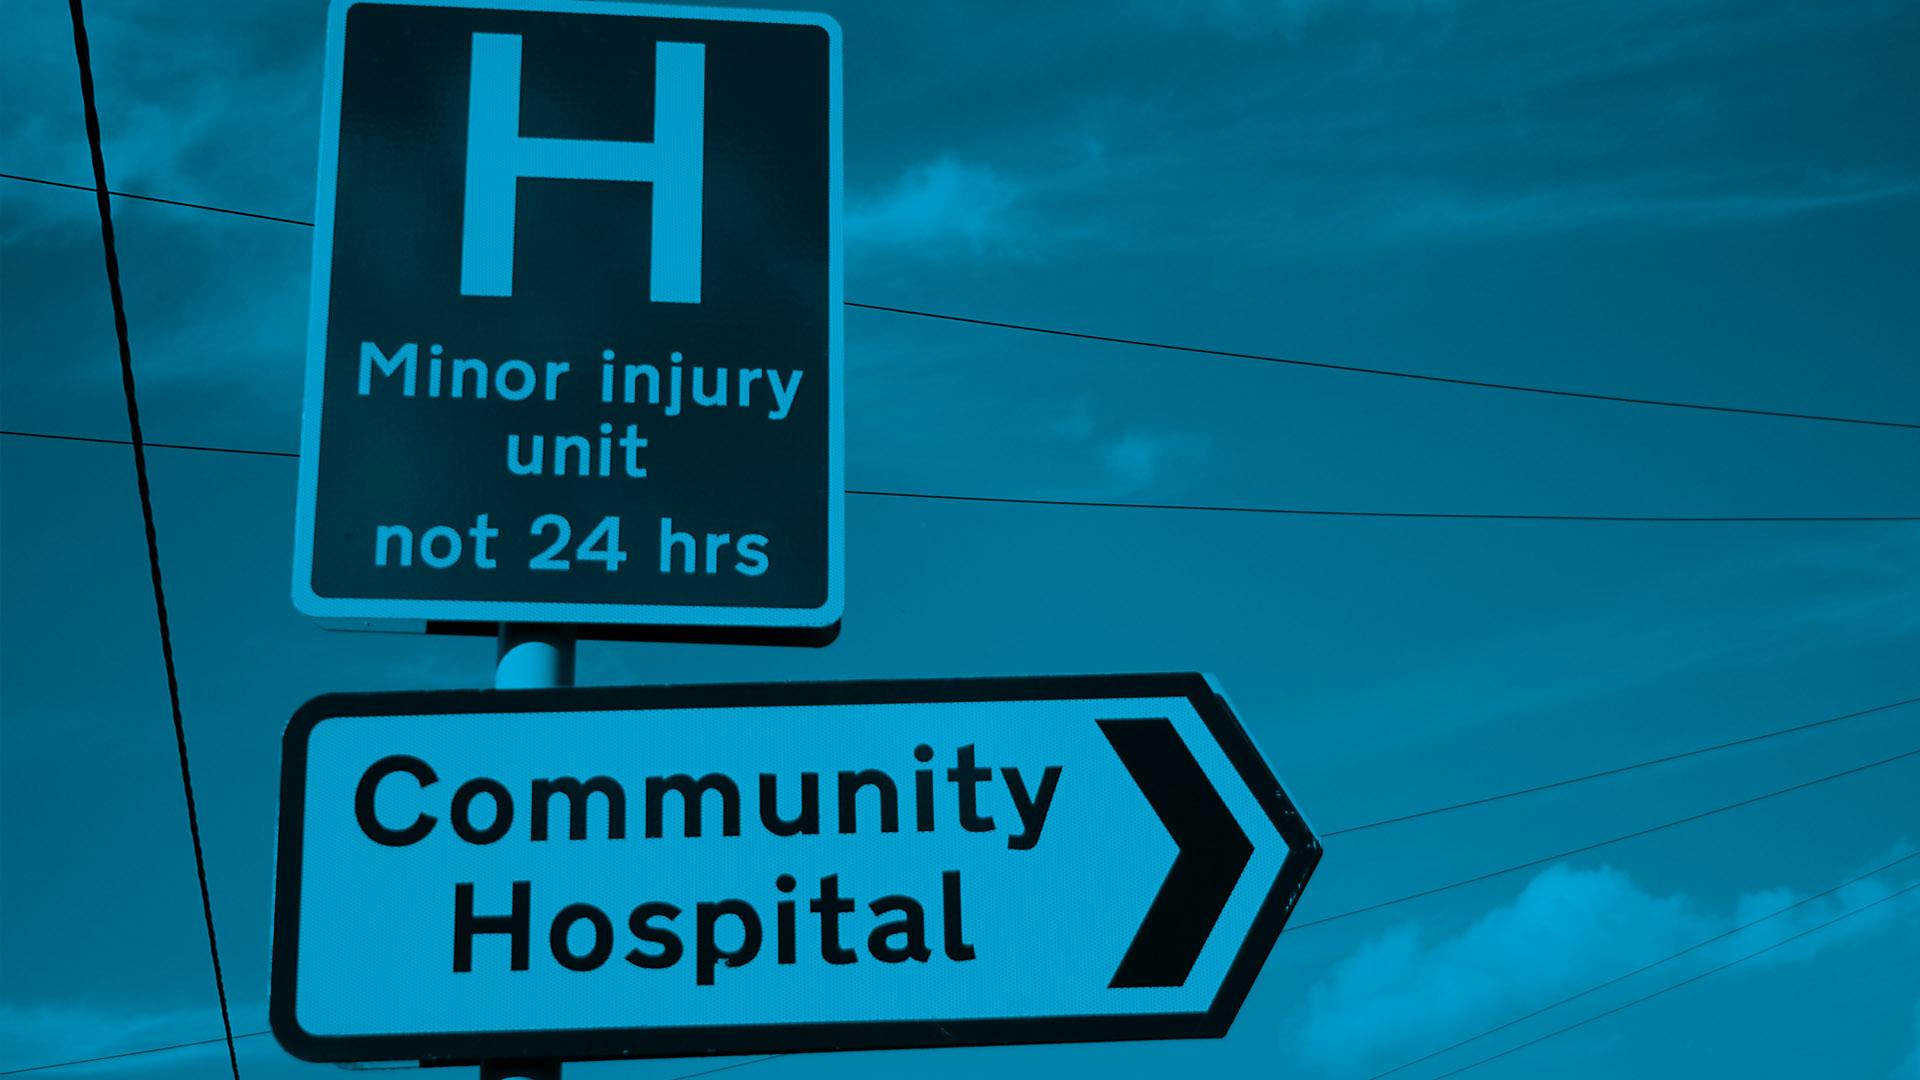 community hospital sign